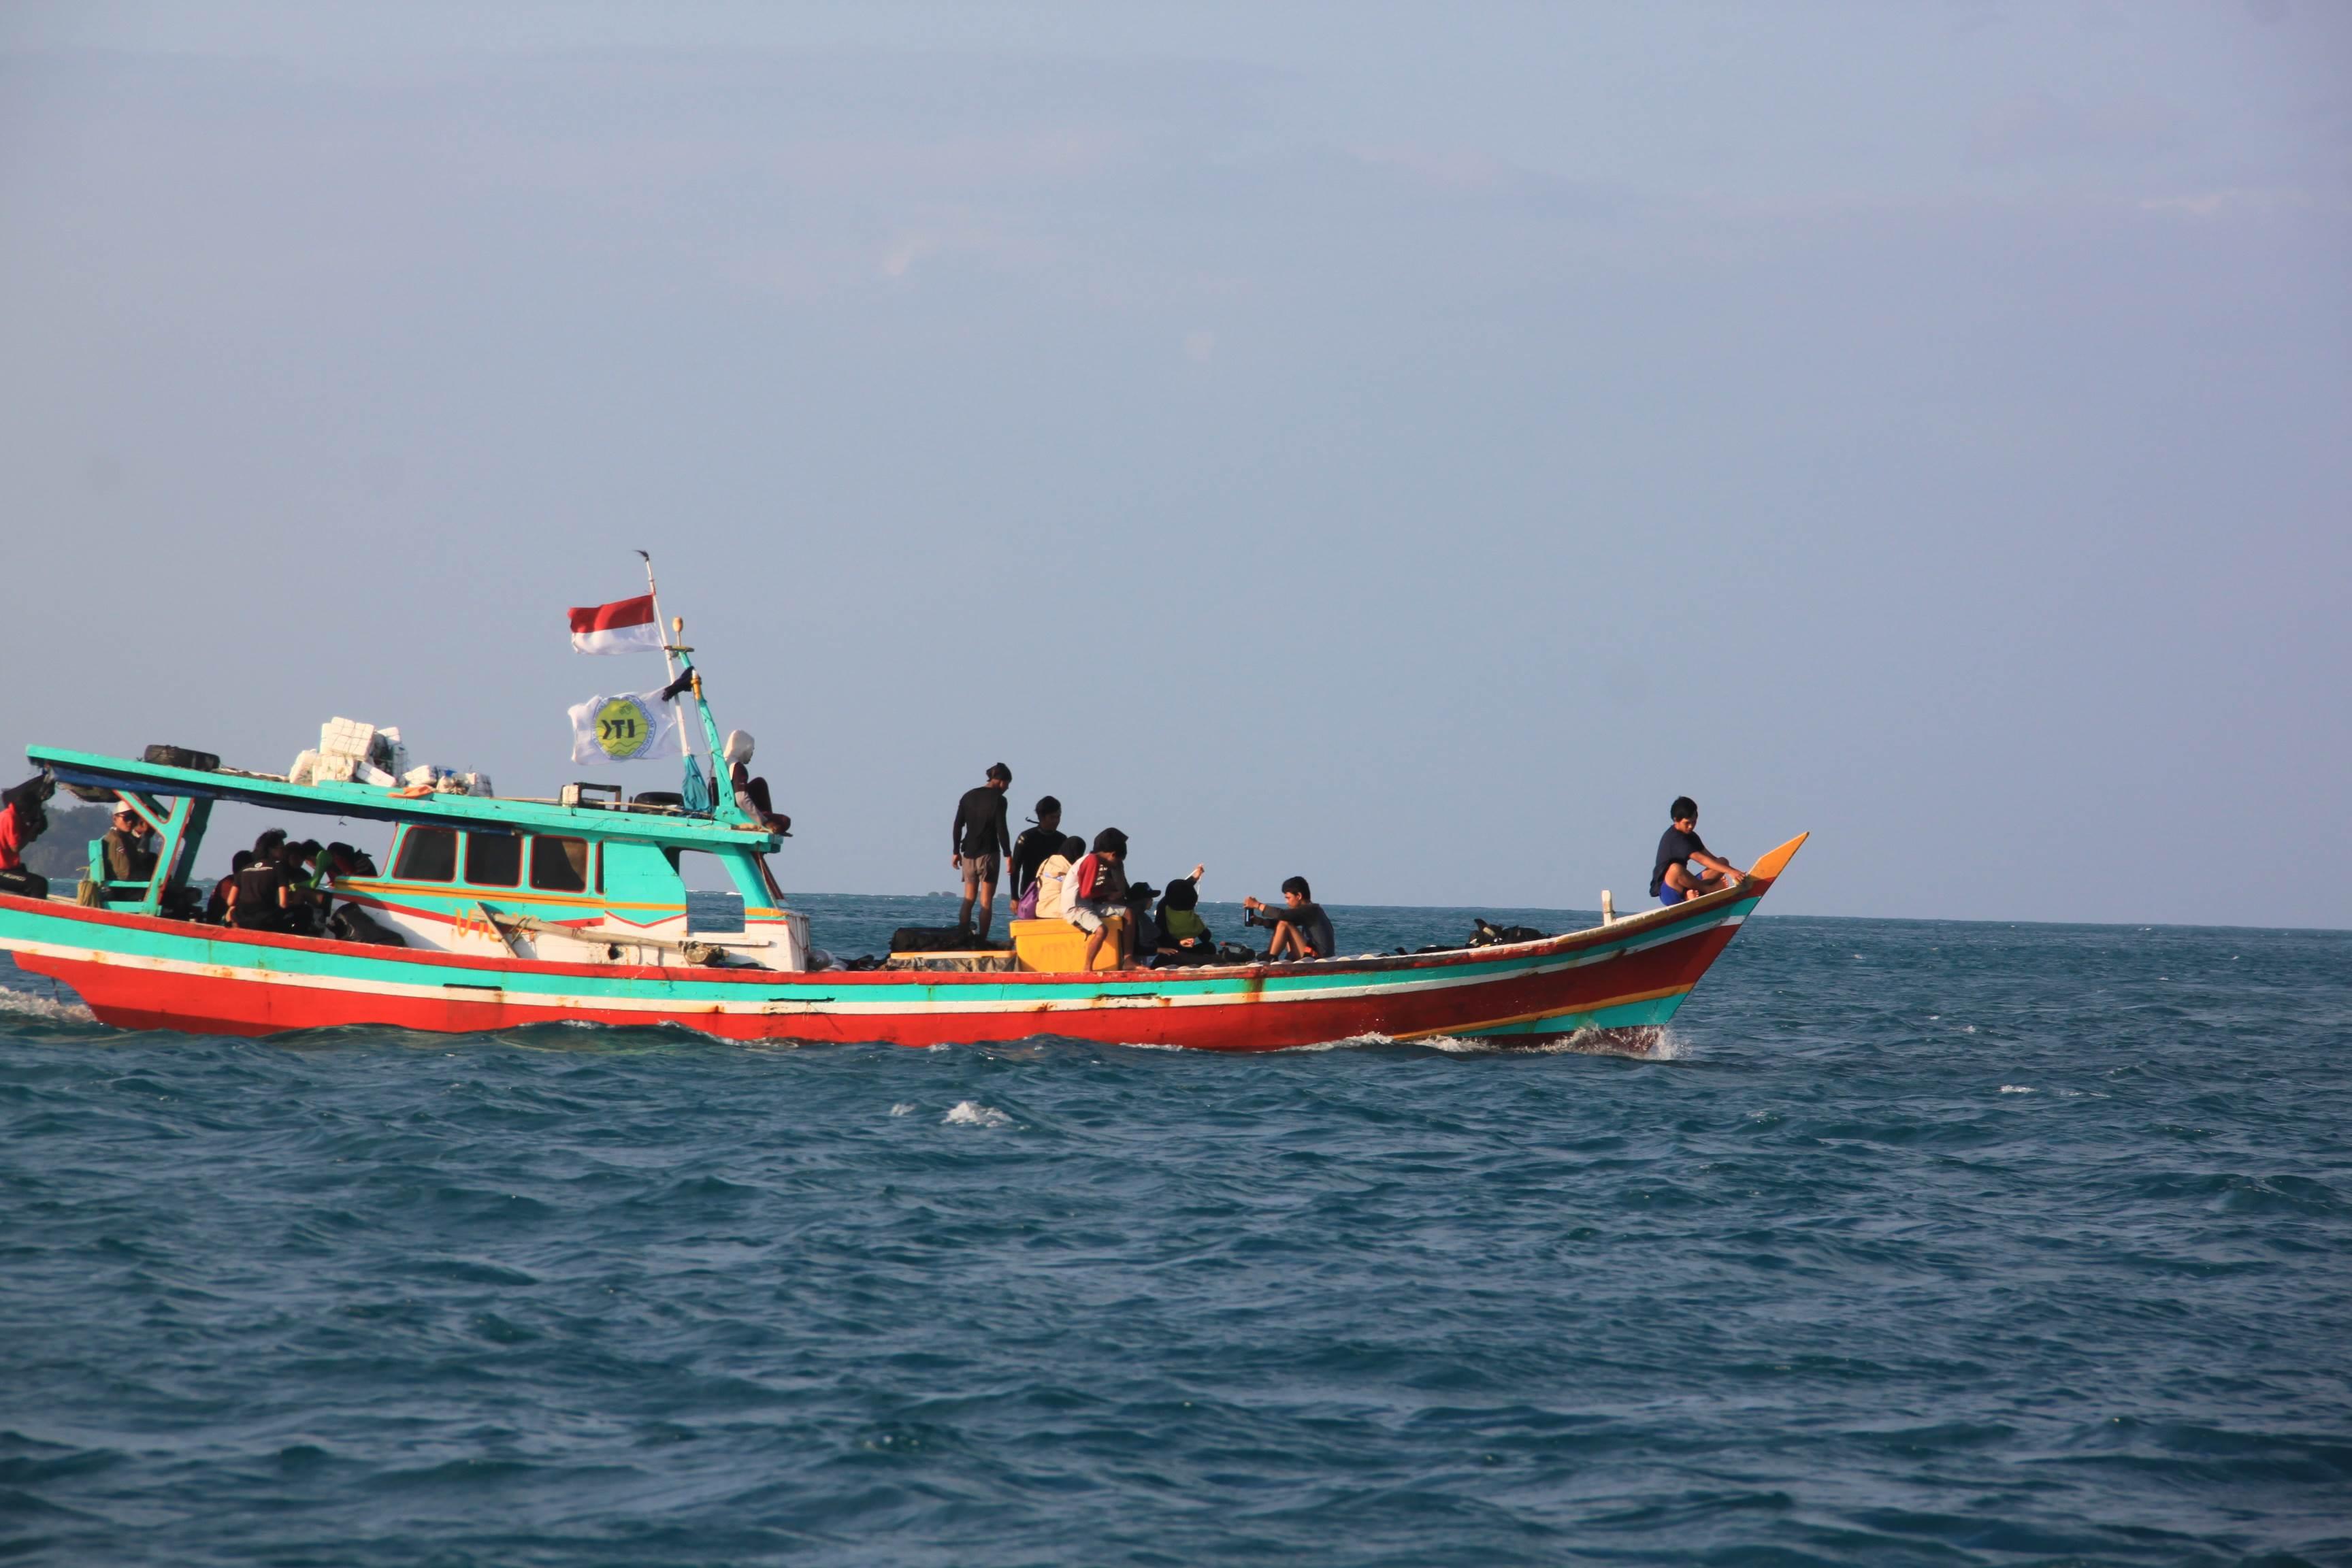 Tim Ekspedisi Himiteka IV menuju lokasi pengambilan data ekosistem terumbu karang